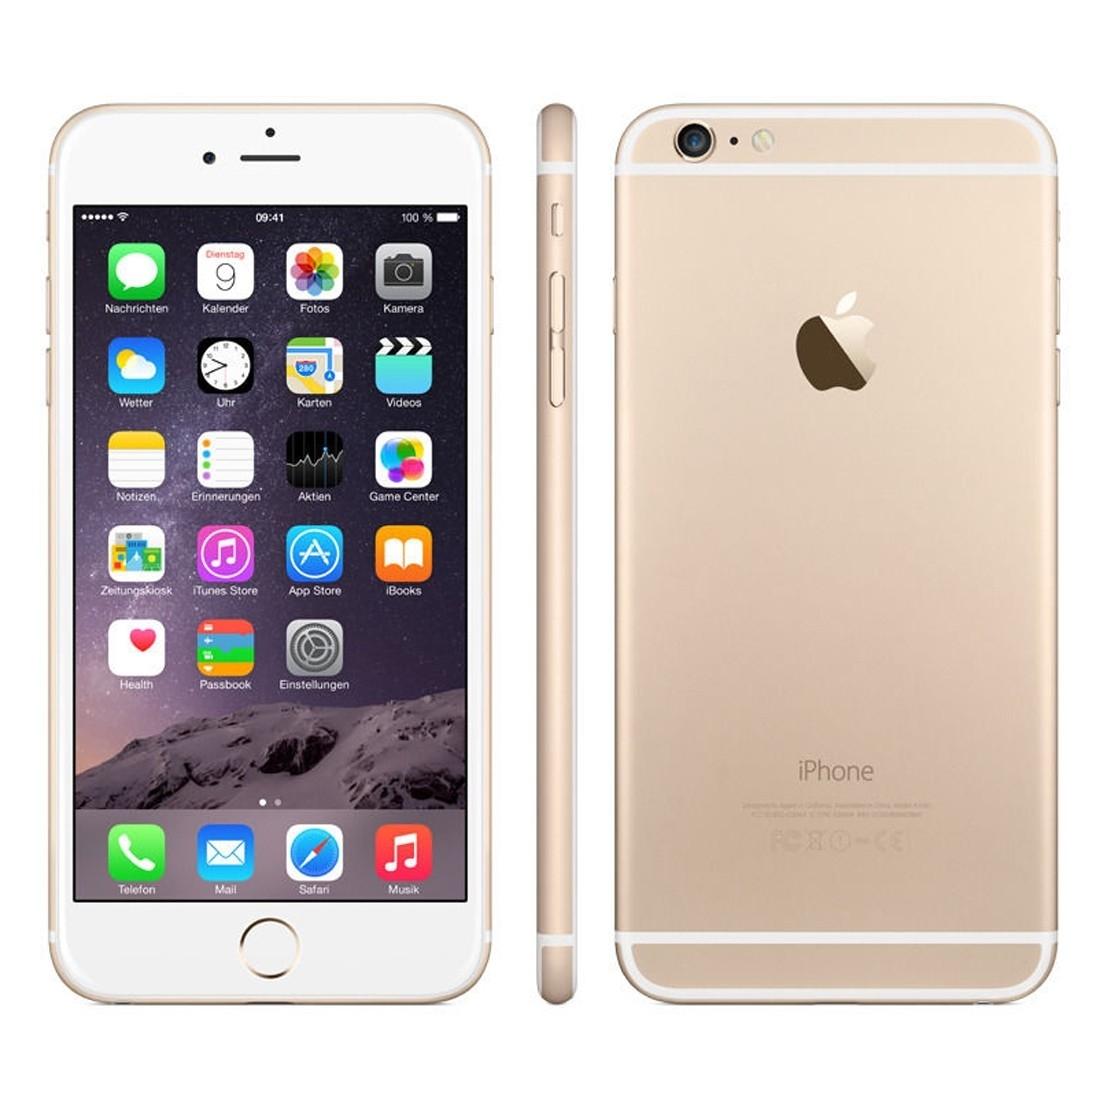 Apple iPhone 6 16GB Dual Core 4 7